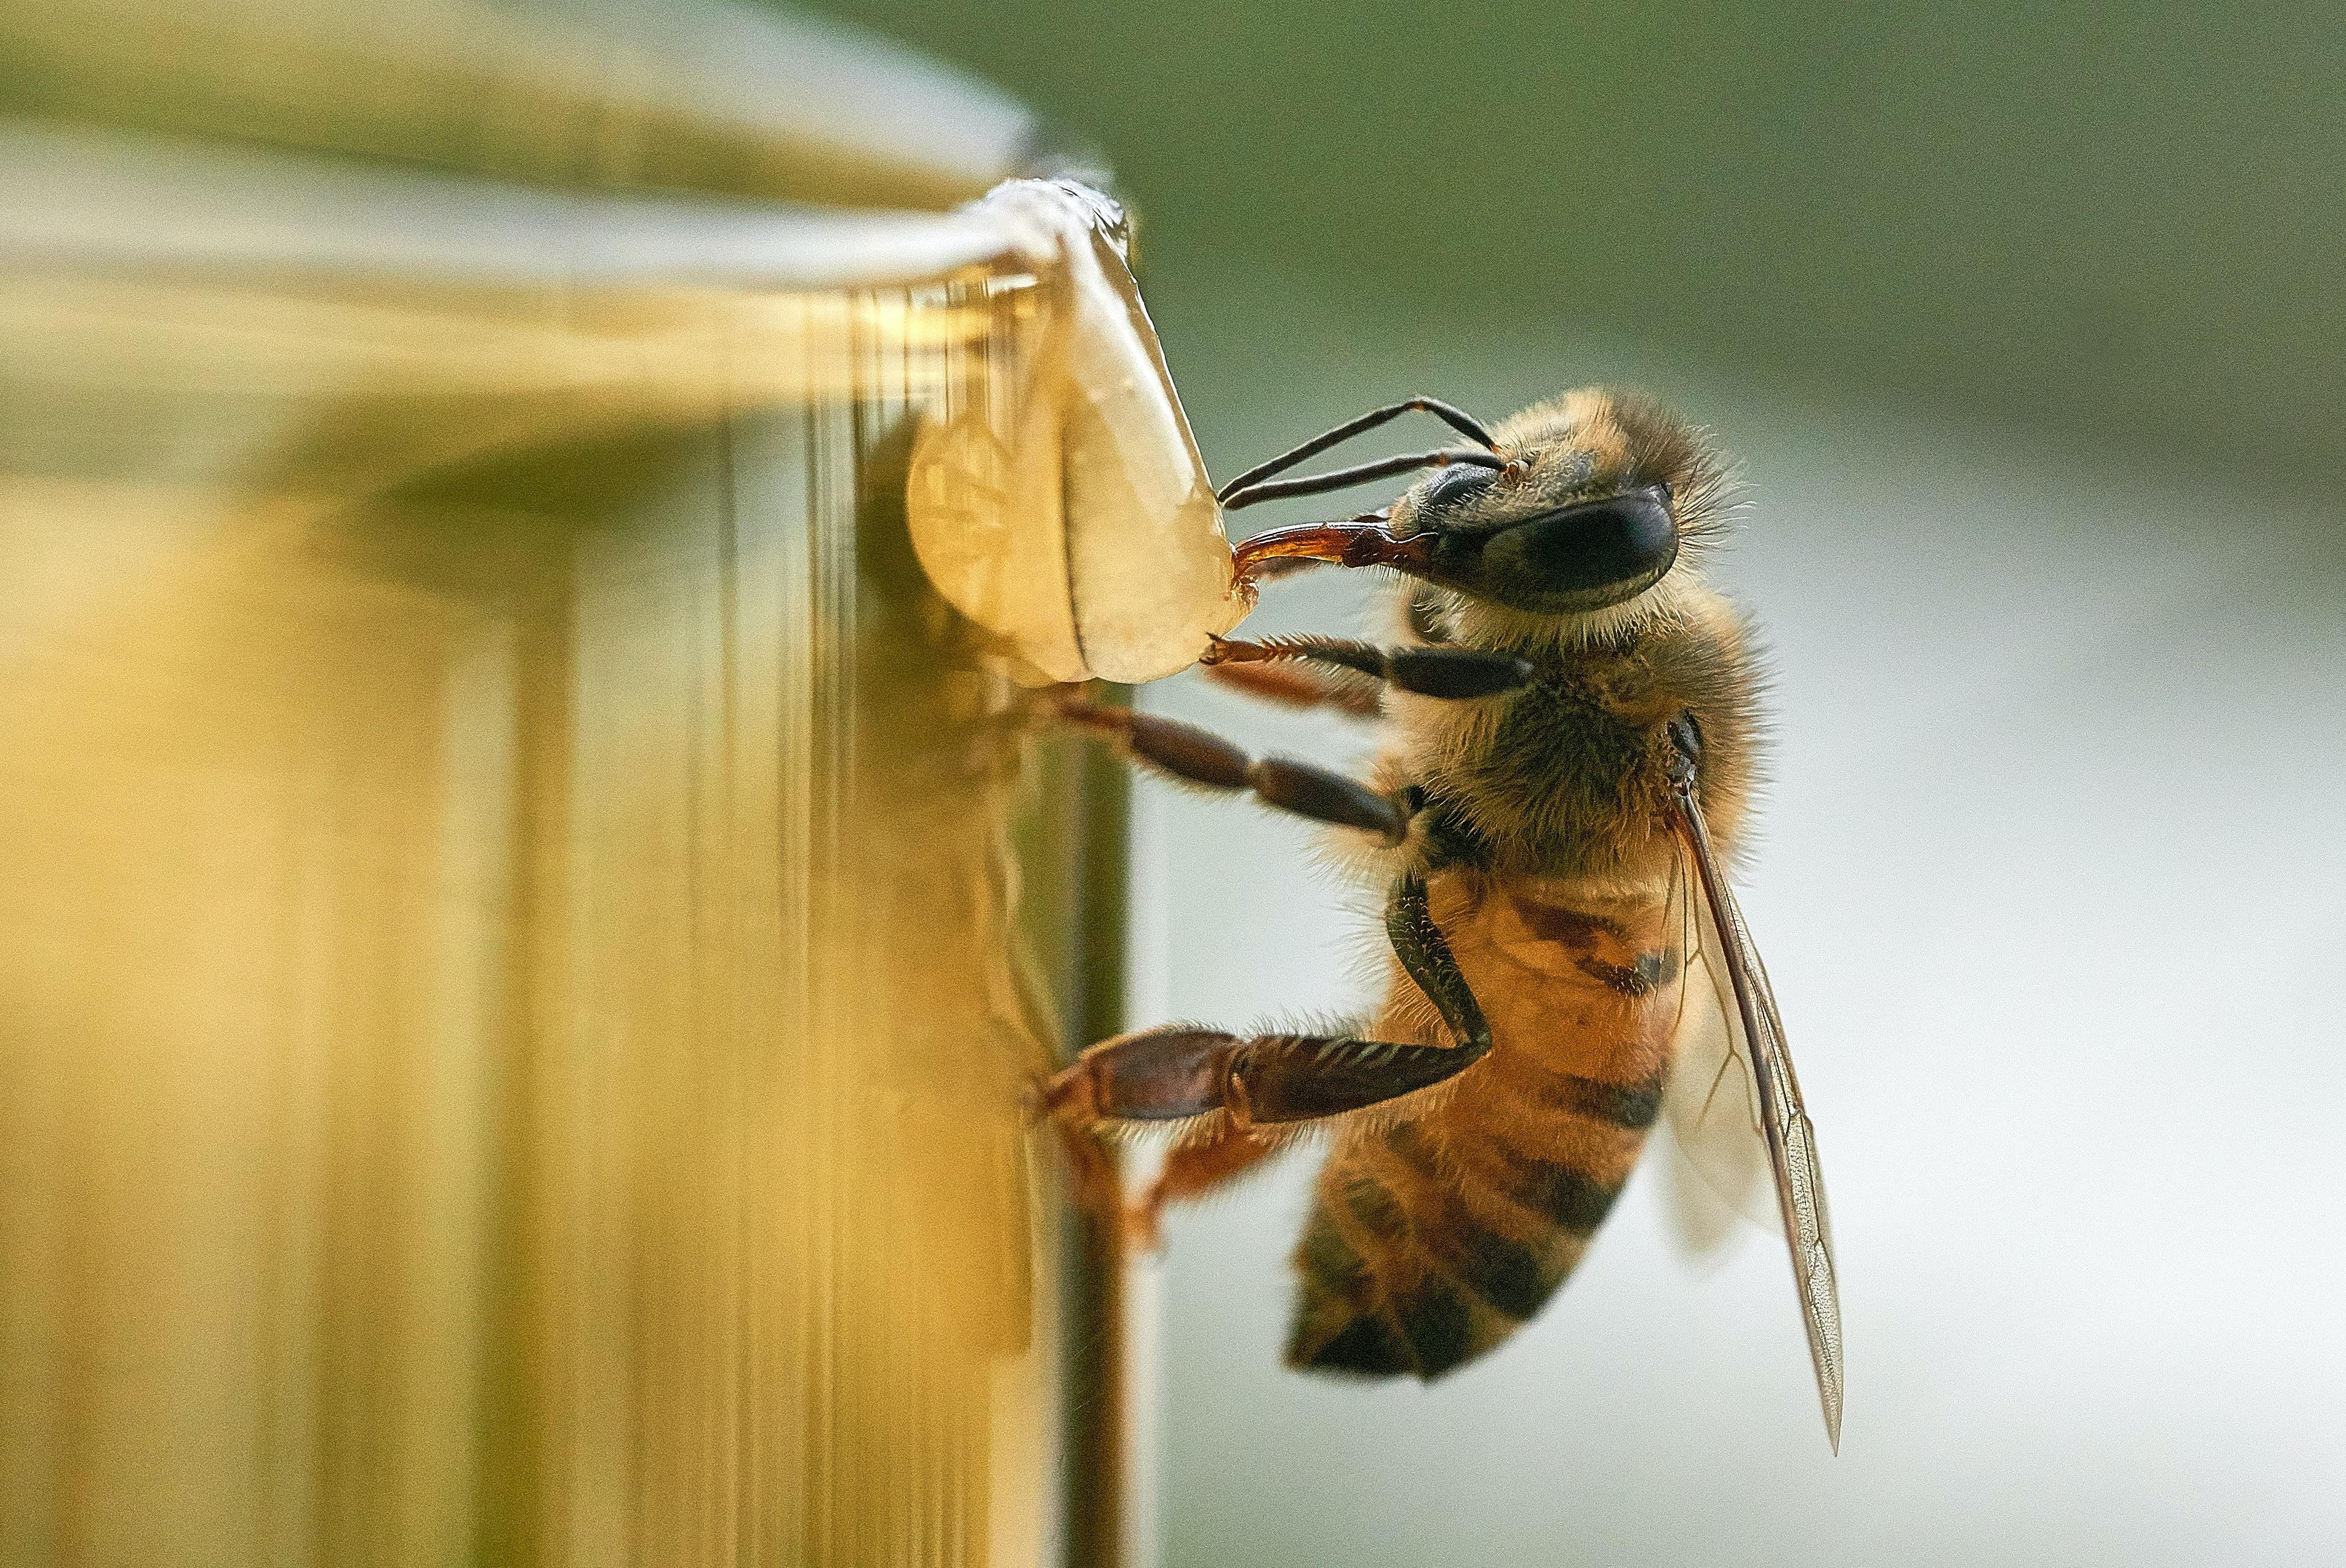 Por seu protagonismo na agroindústria, abelhas têm um papel fundamental na economia do planeta. (Foto: Leandro Fregoni/Unsplash)